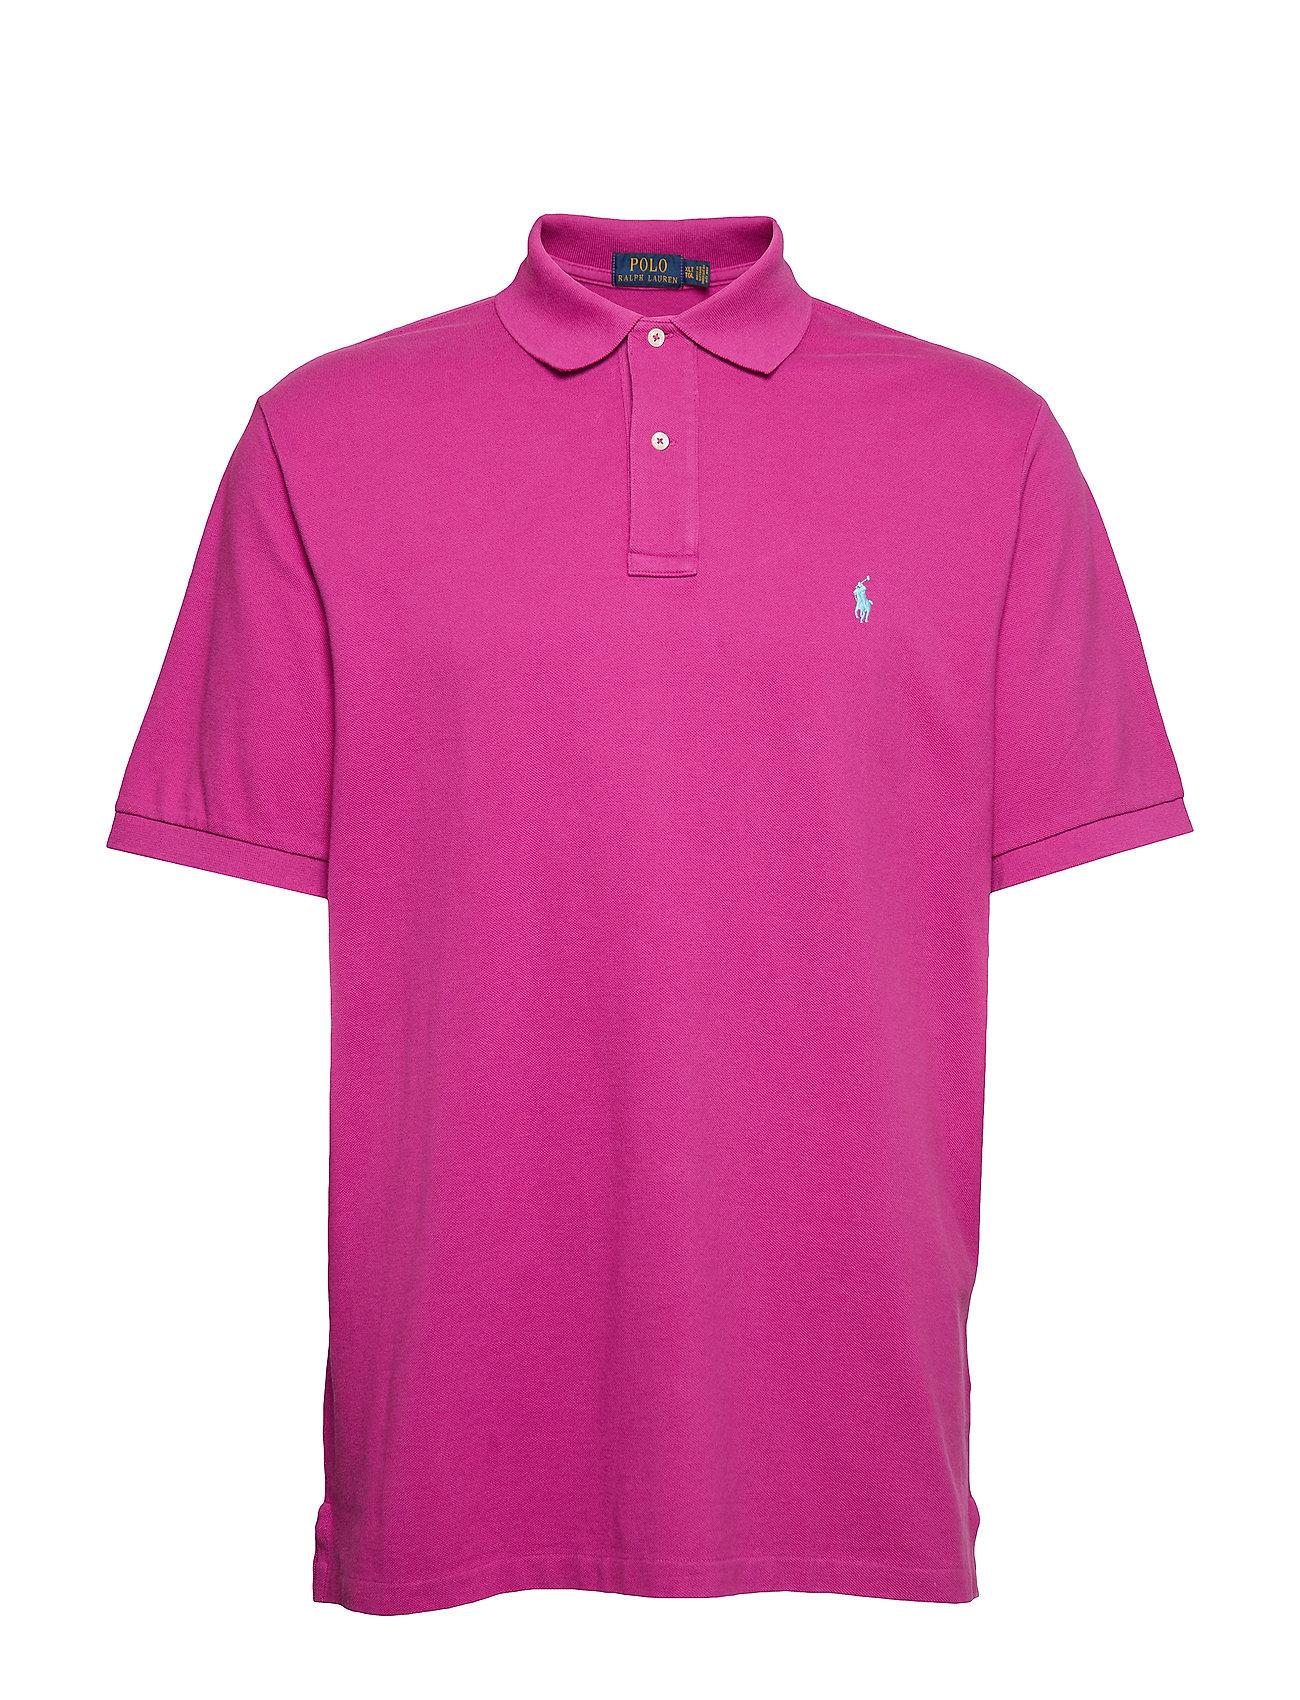 Polo Ralph Lauren Big & Tall Classic Fit Mesh Polo Shirt - ROYAL MAGENTA